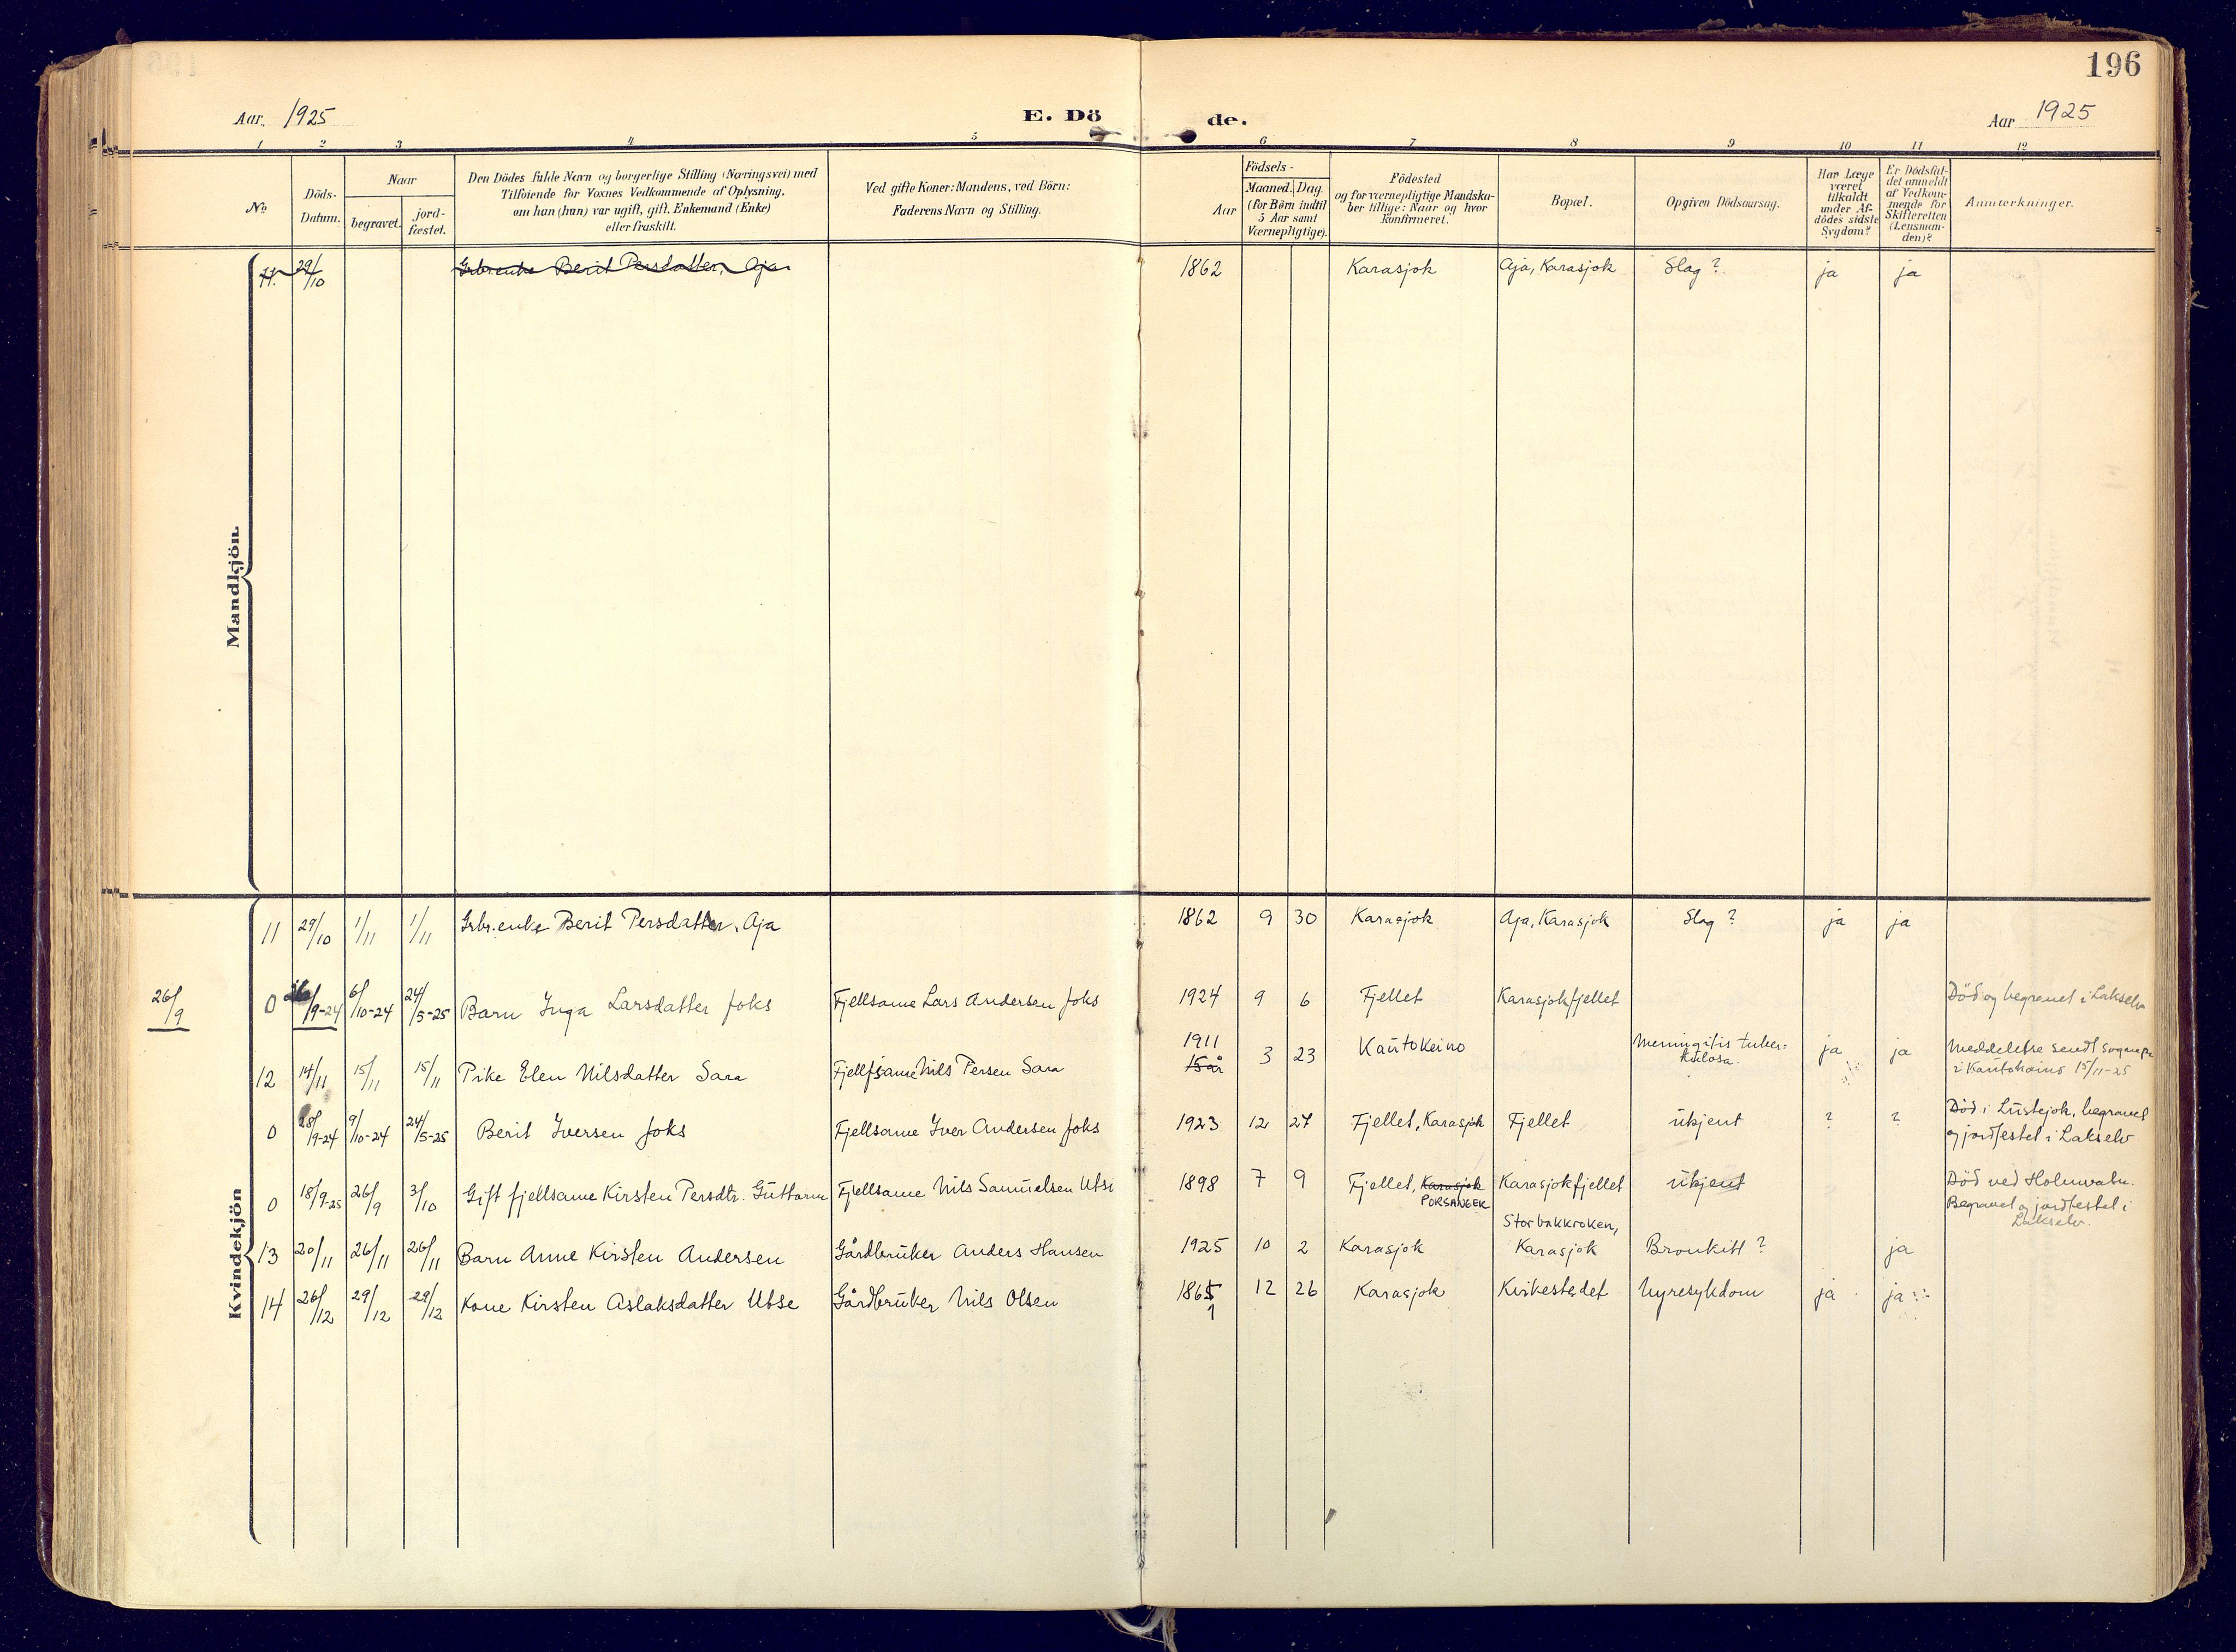 SATØ, Karasjok sokneprestkontor, H/Ha: Ministerialbok nr. 3, 1907-1926, s. 196